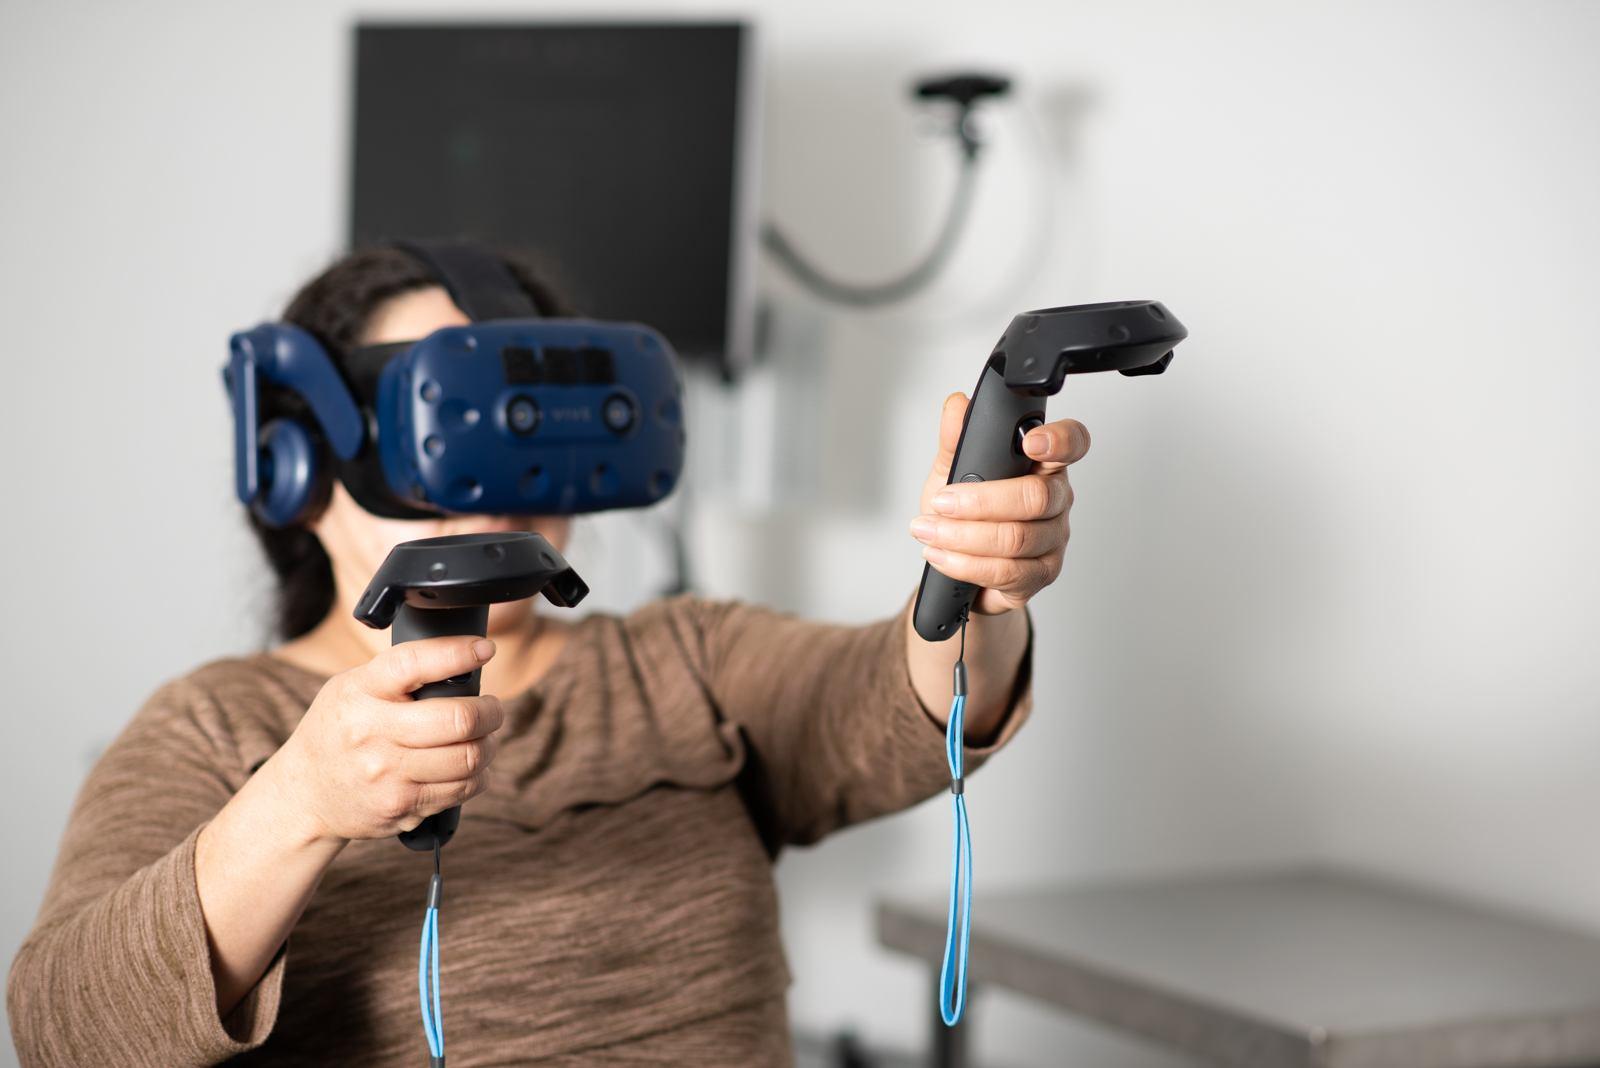 VR for Chronic Pain Startup Karuna Labs Raises $3M to Retrain The Brain